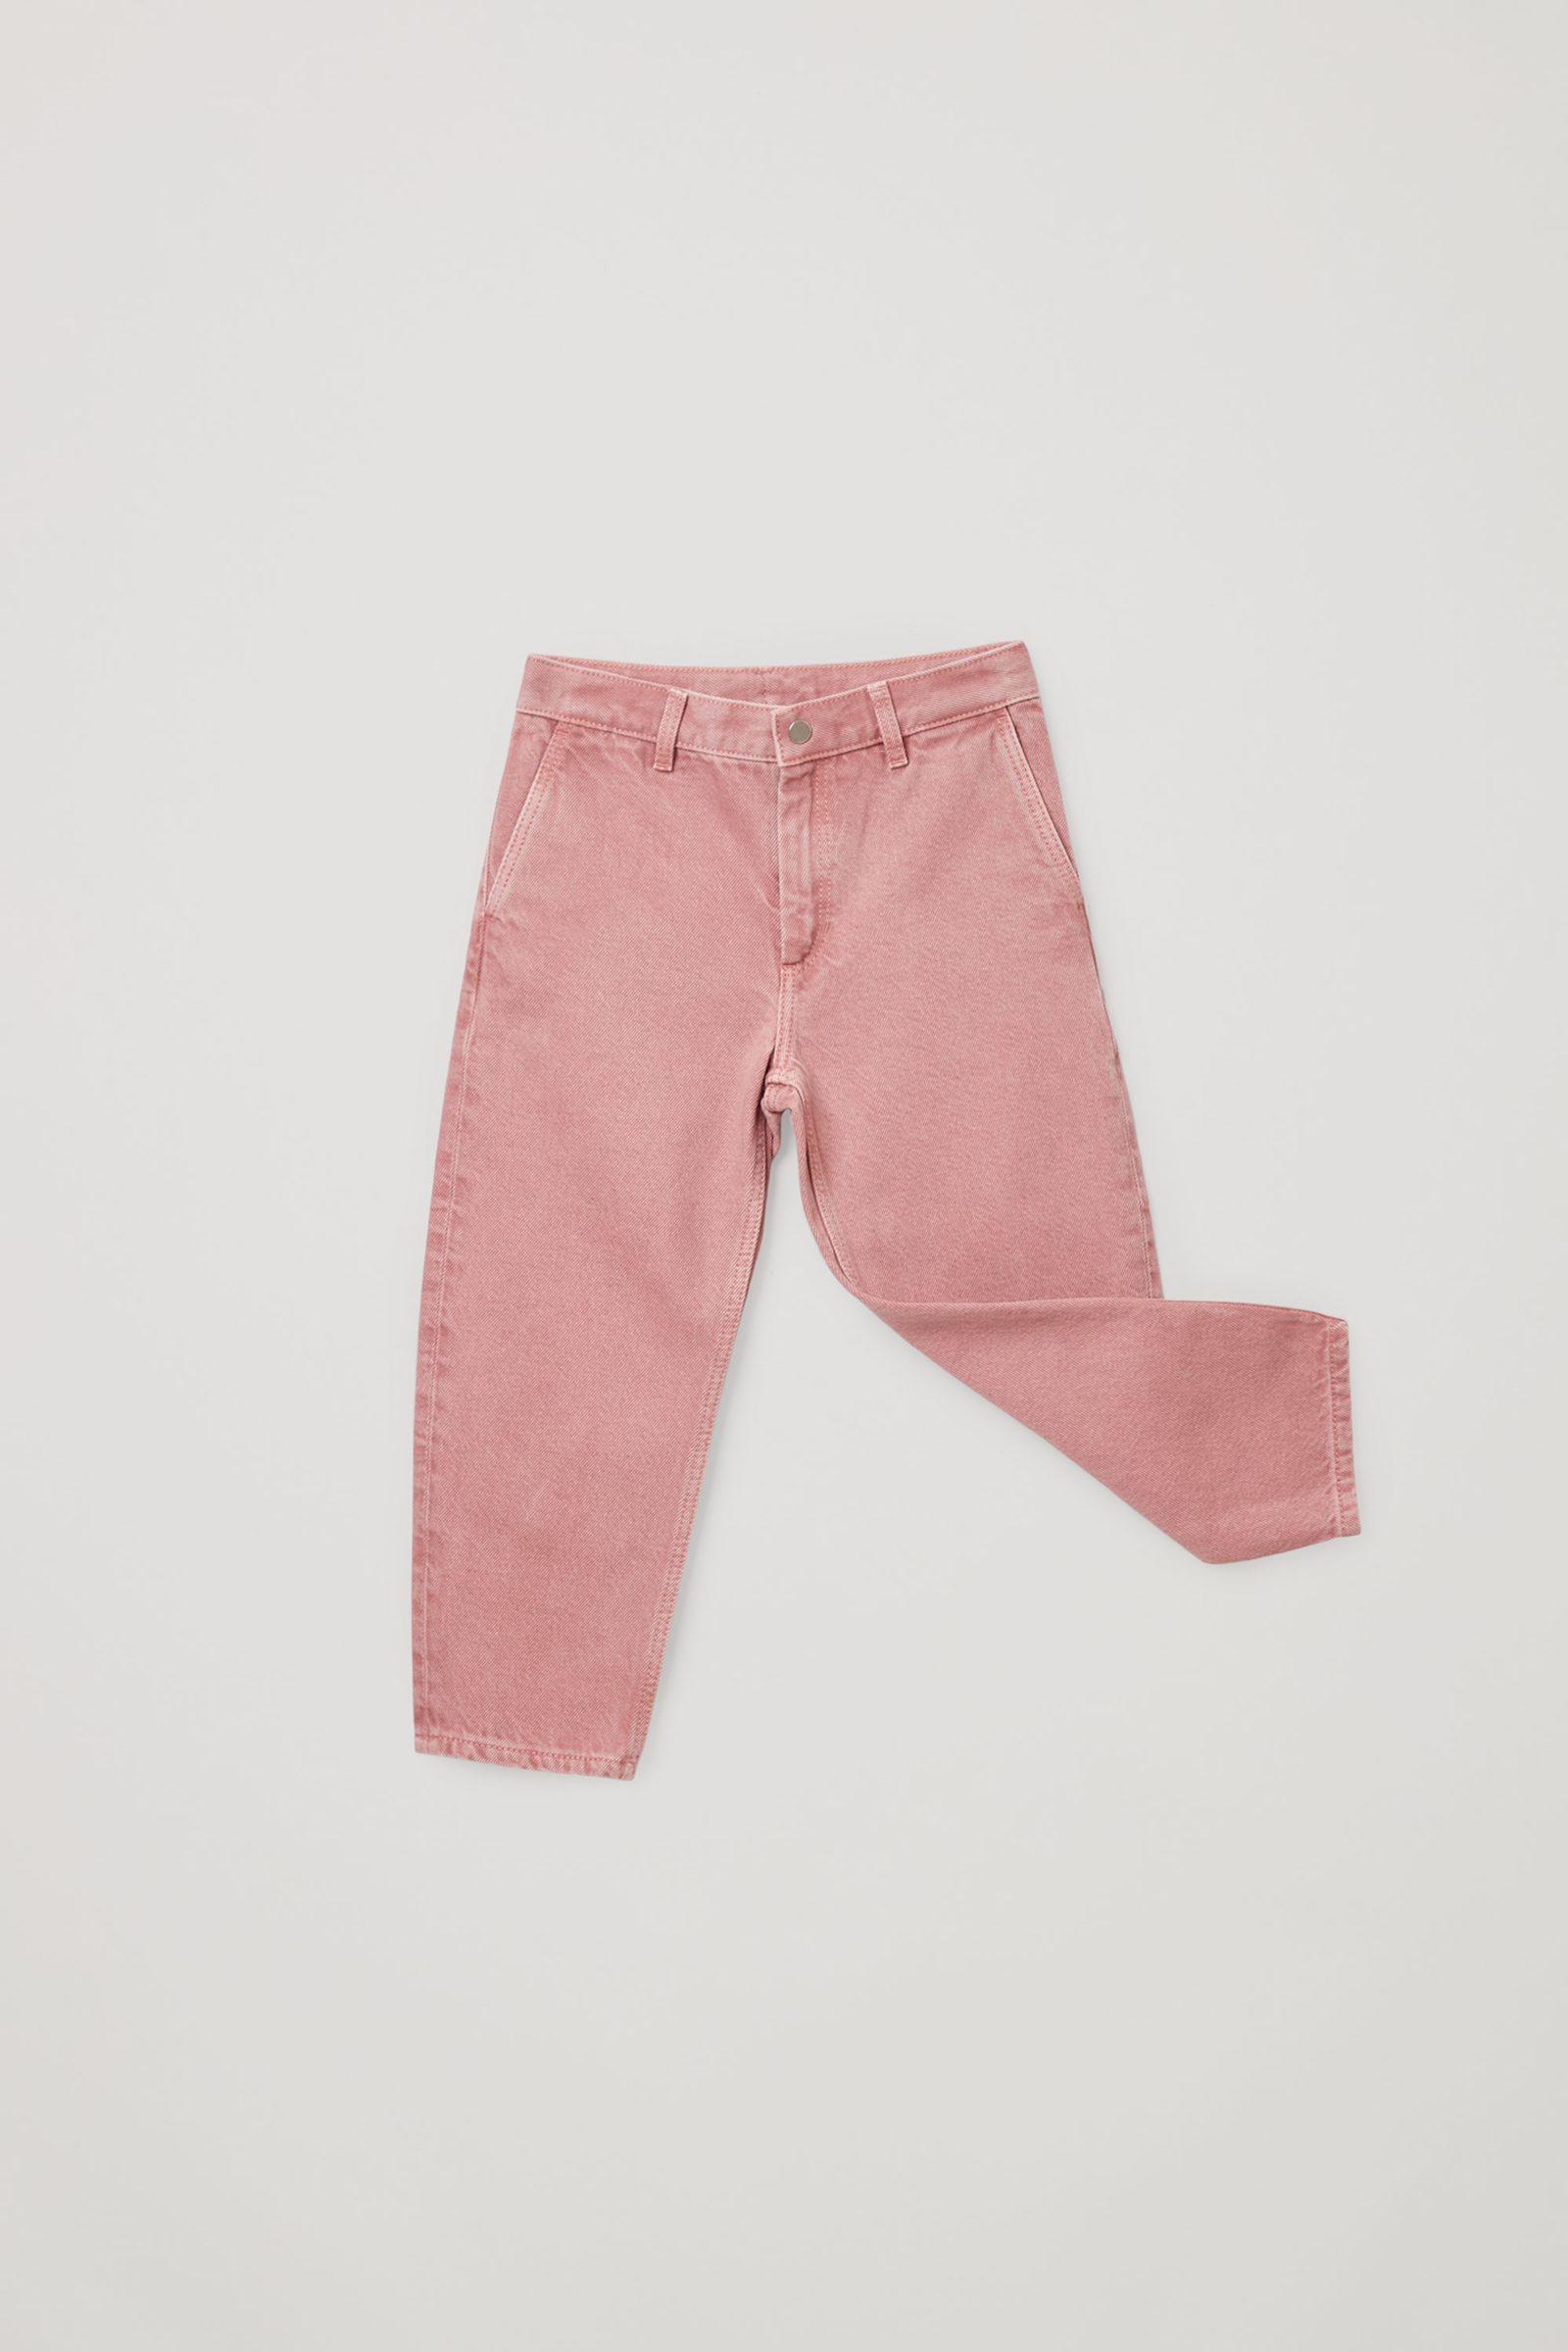 COS 오가닉 코튼 배럴 진의 핑크컬러 Product입니다.